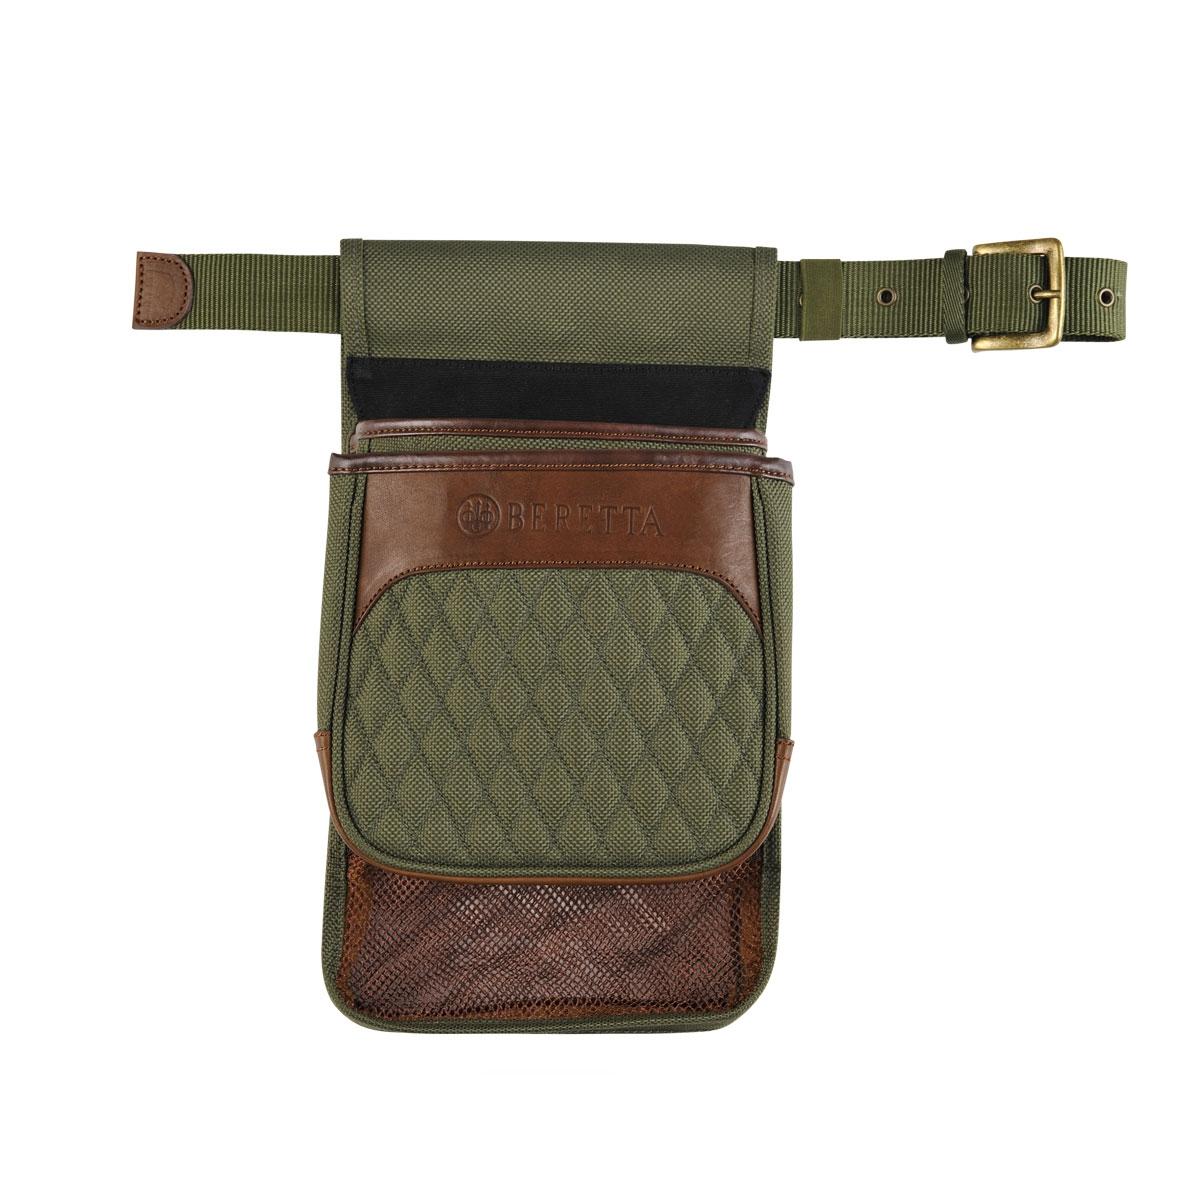 Beretta B1 Signature Cartridge Hull Pouch with Mesh | Uttings.co.uk